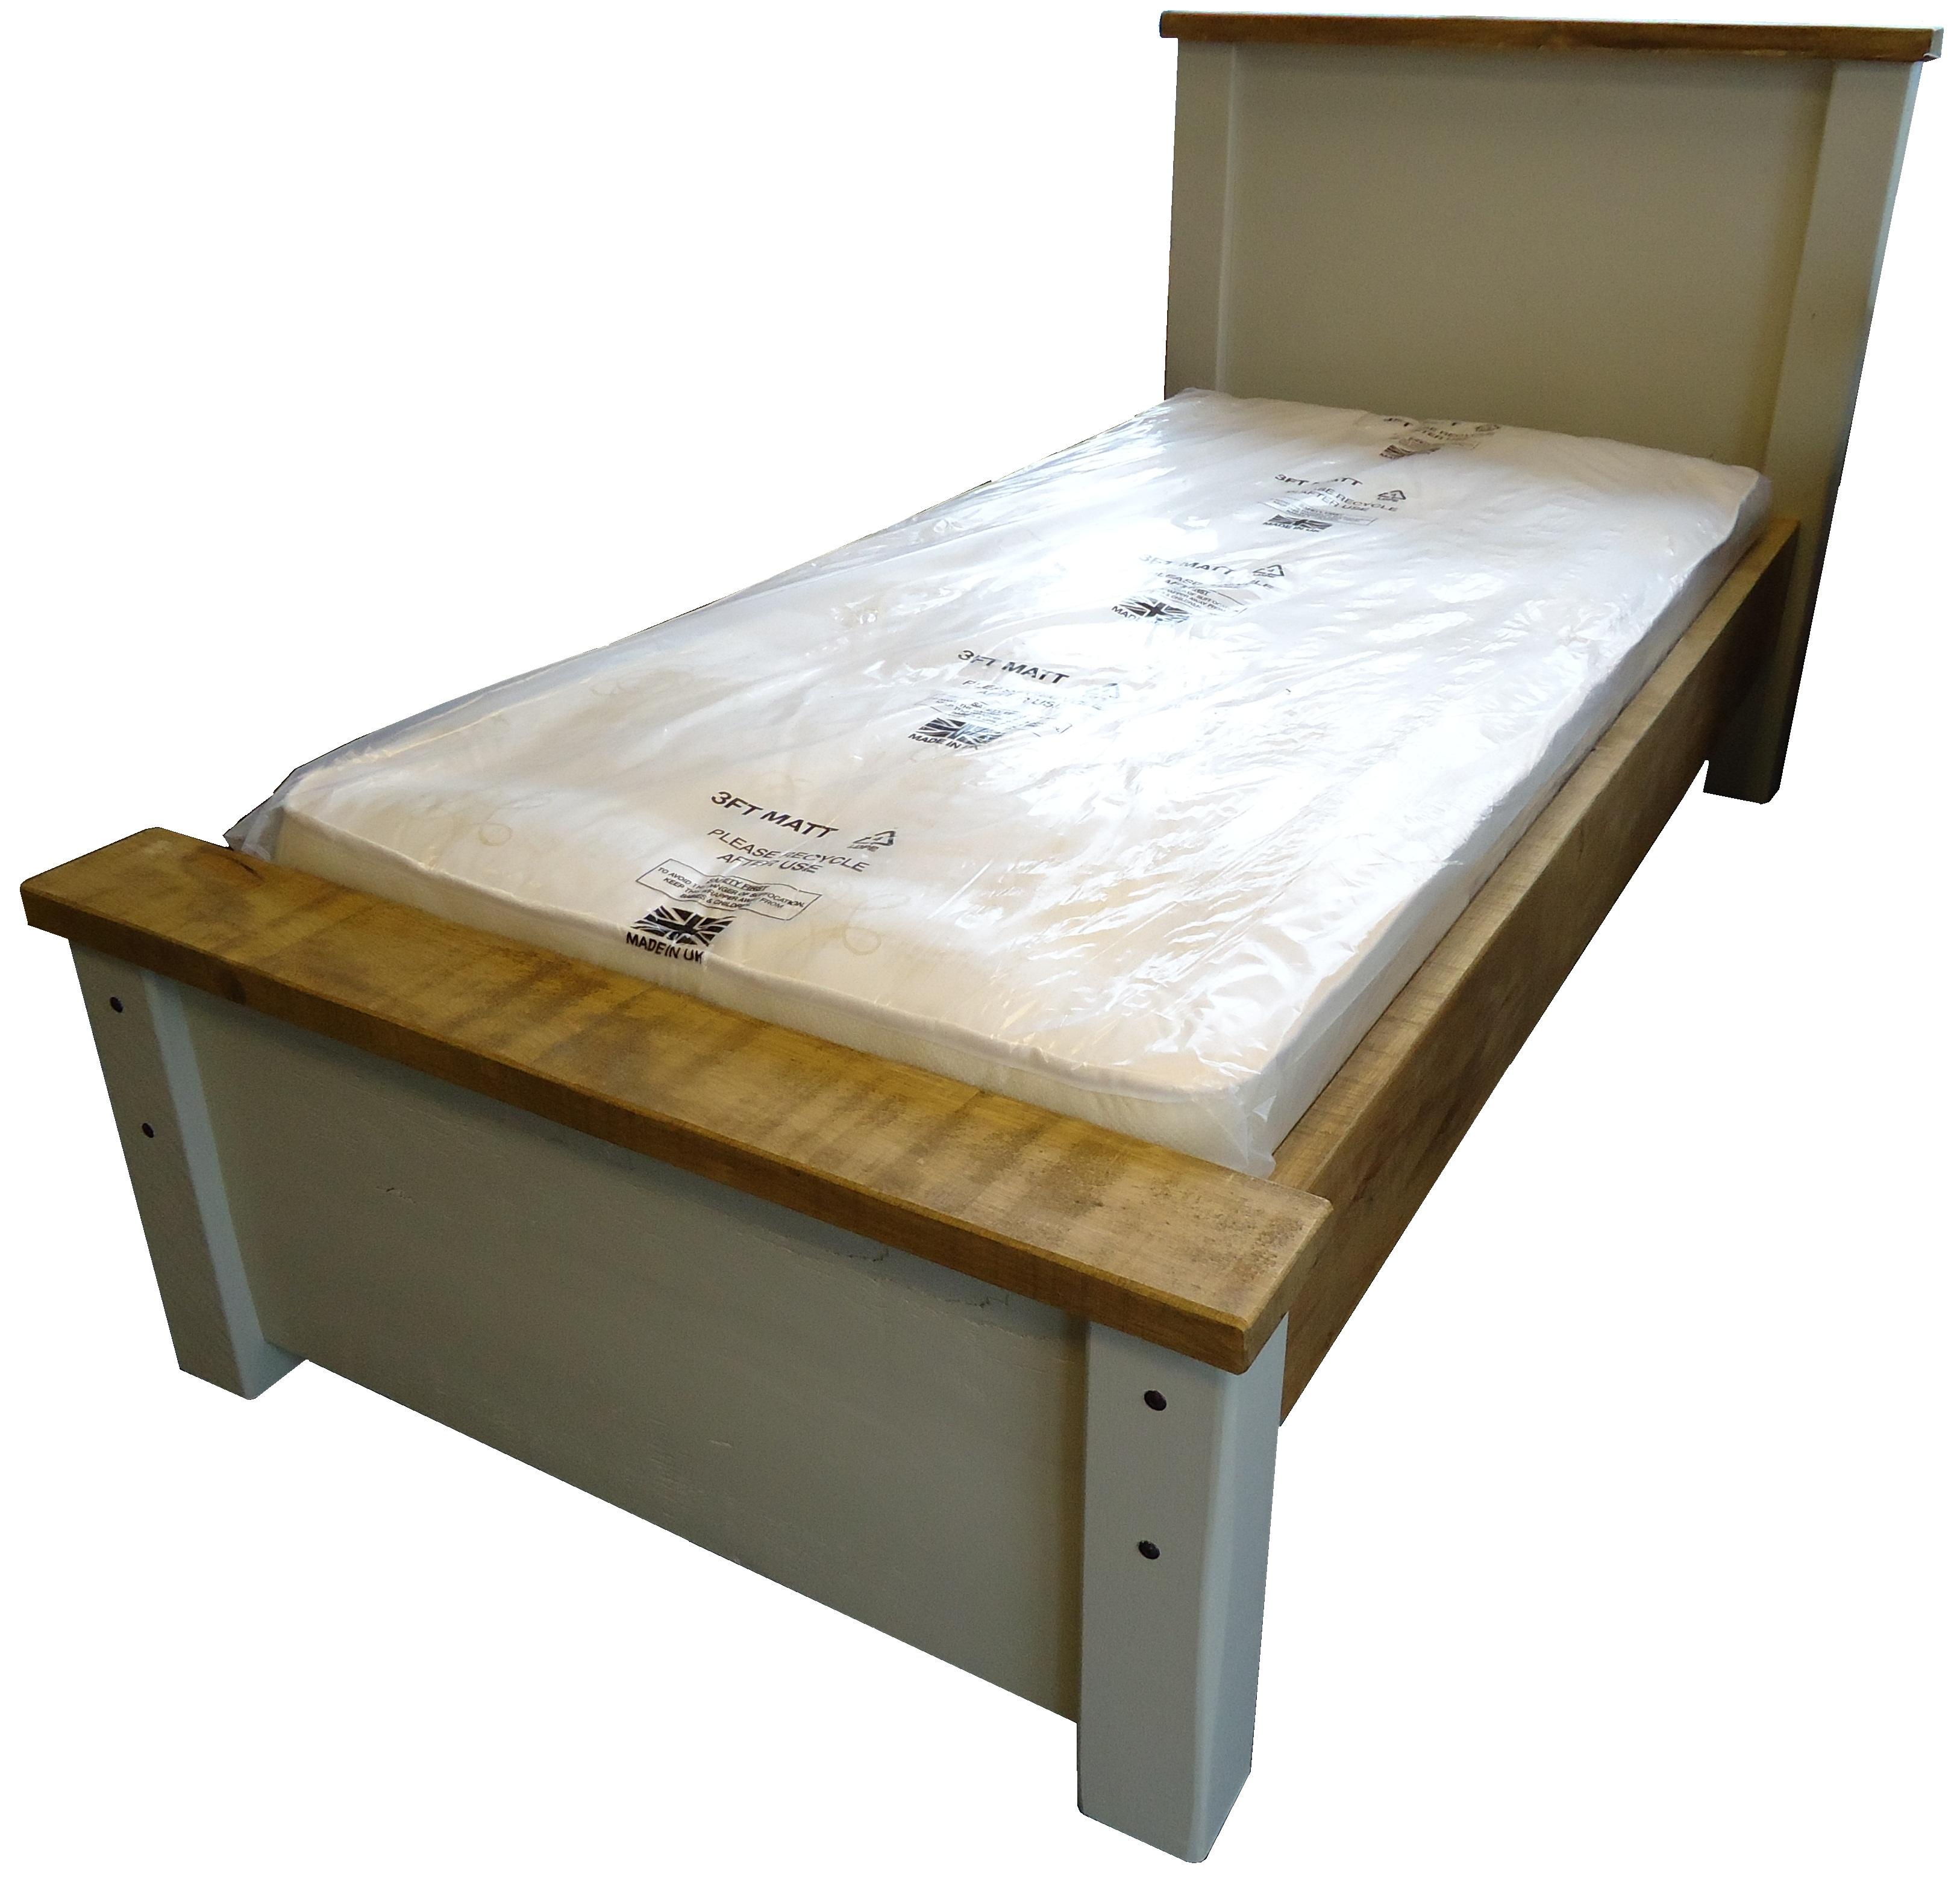 Plank Bedroom Furniture Plank Bedroom Furniture Plank Bedroom Furniture On Sich